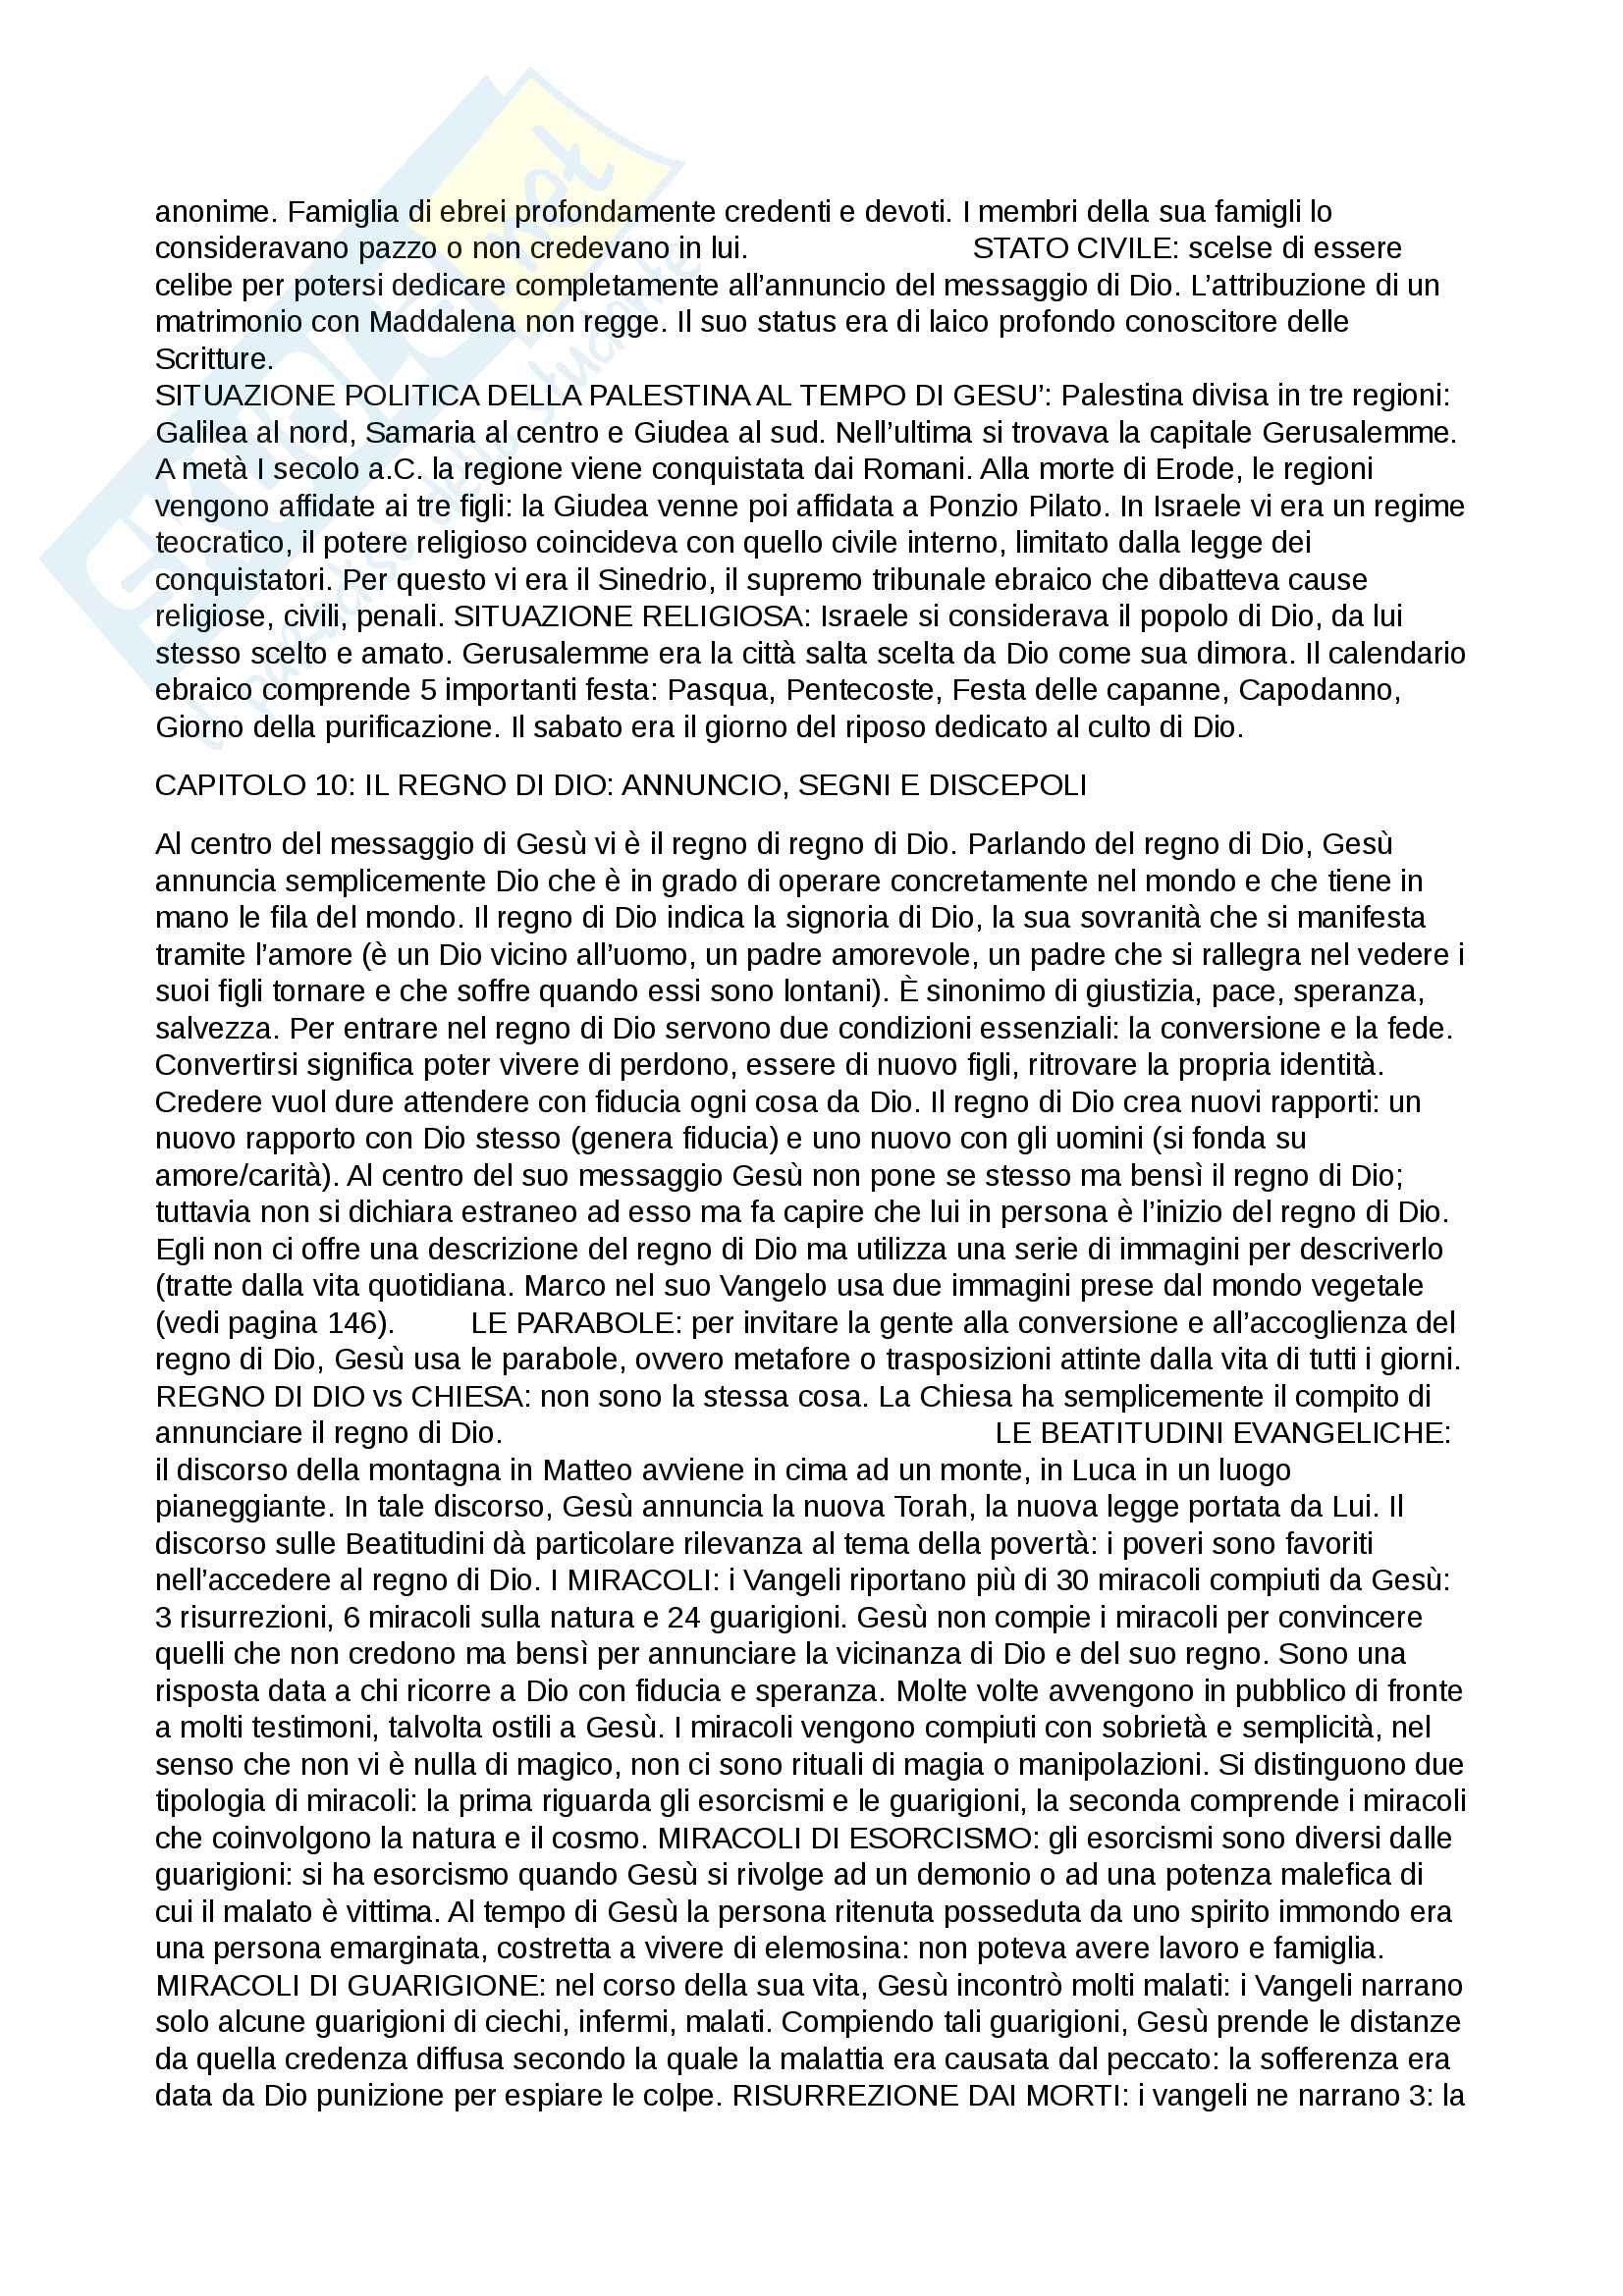 Riassunti esame Teologia I, prof. Bernardino Pessani, dispensa consigliata Introduzione alla teologia e questioni di teologia fondamentale Pag. 11